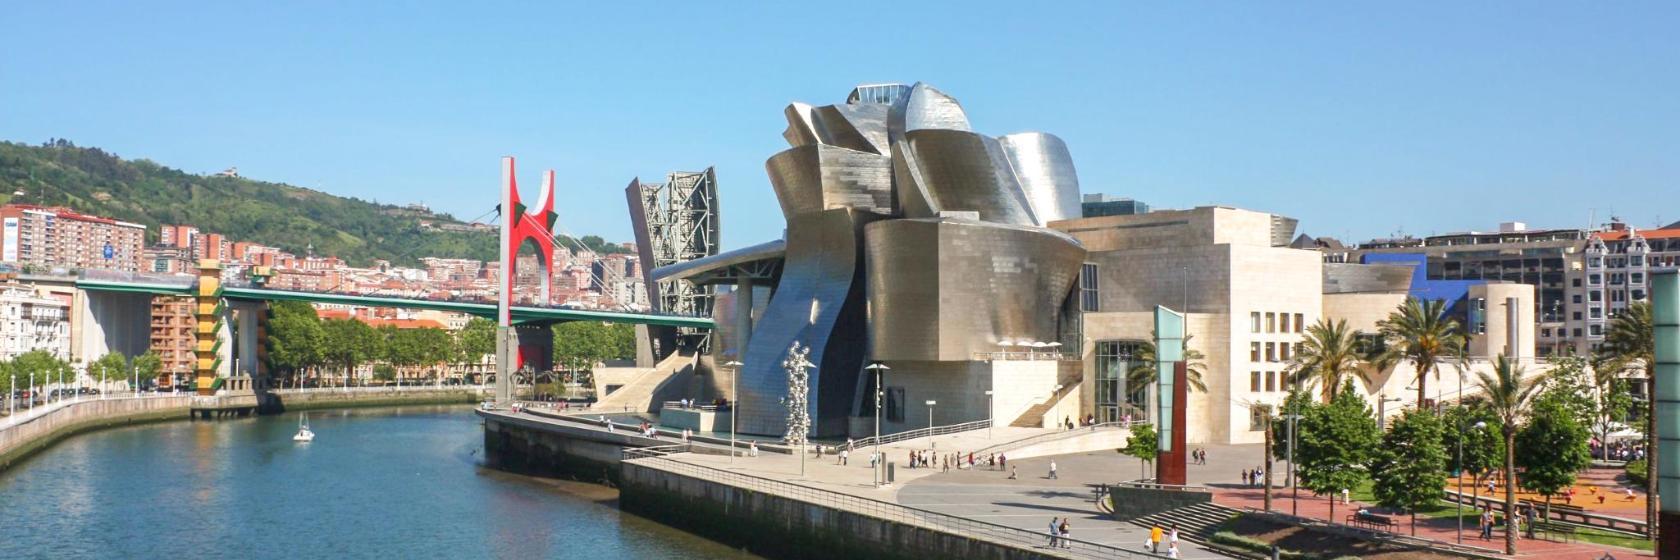 Los 10 mejores hoteles cerca de Museo Guggenheim de Bilbao ...